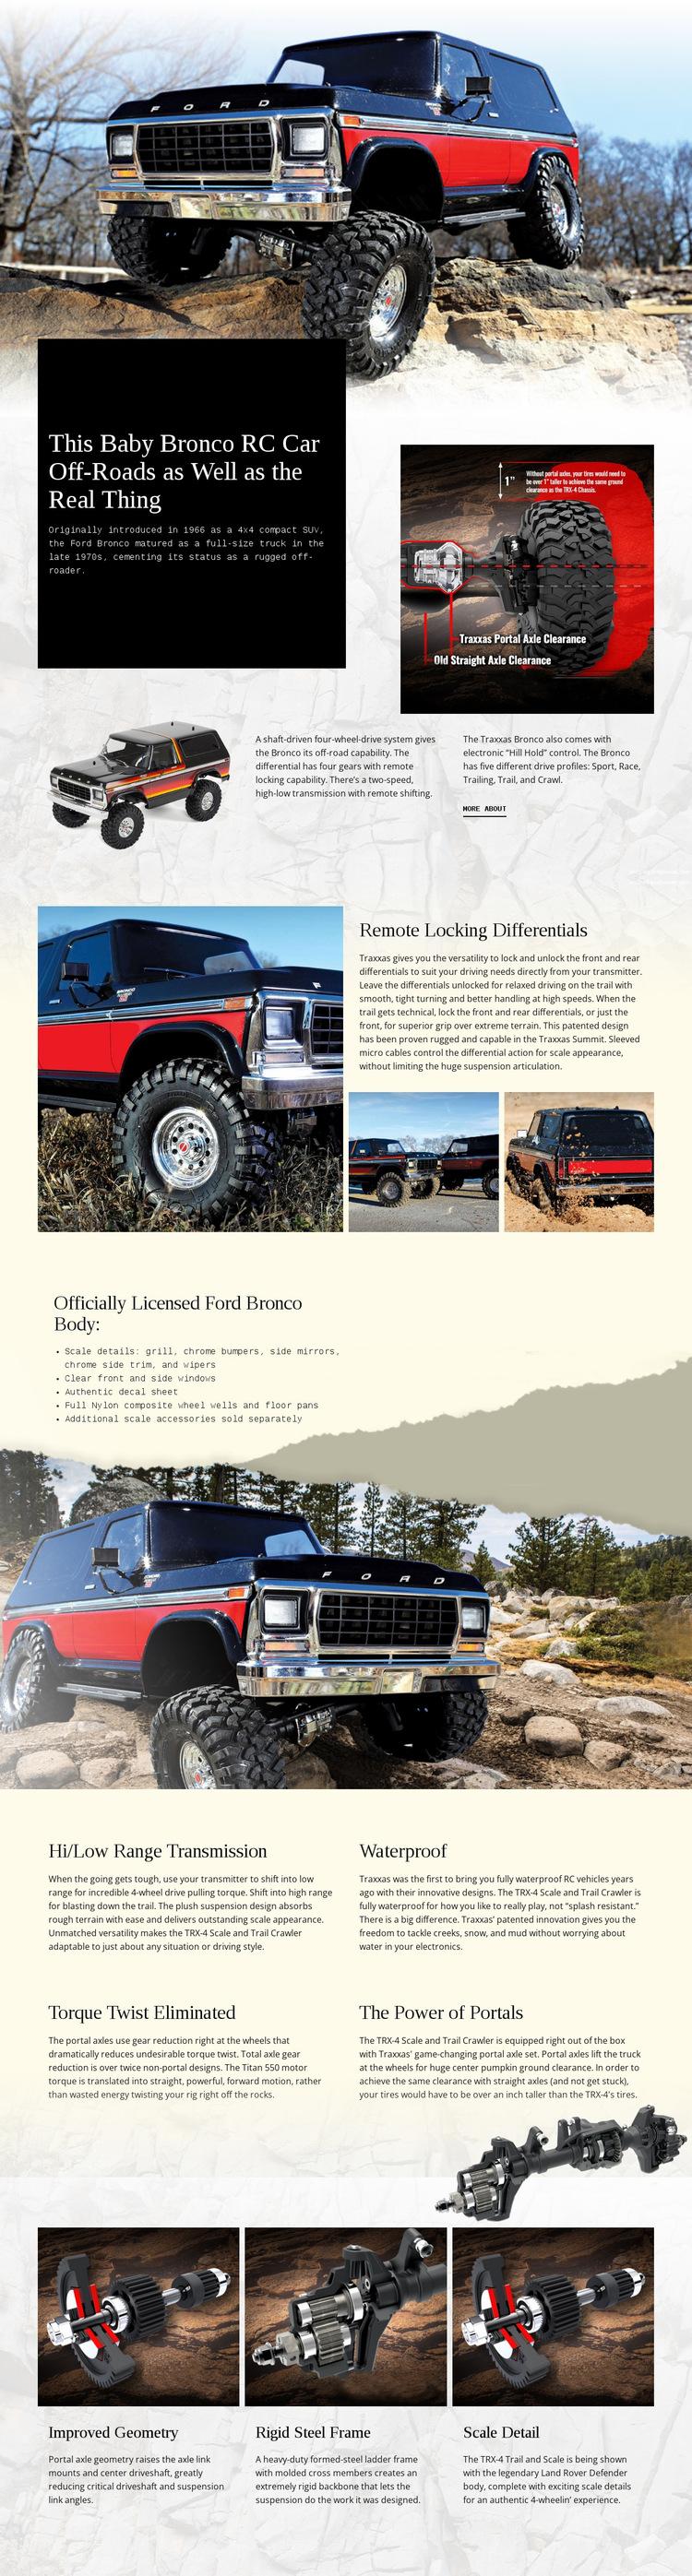 Bronco Rc Car Website Builder Templates